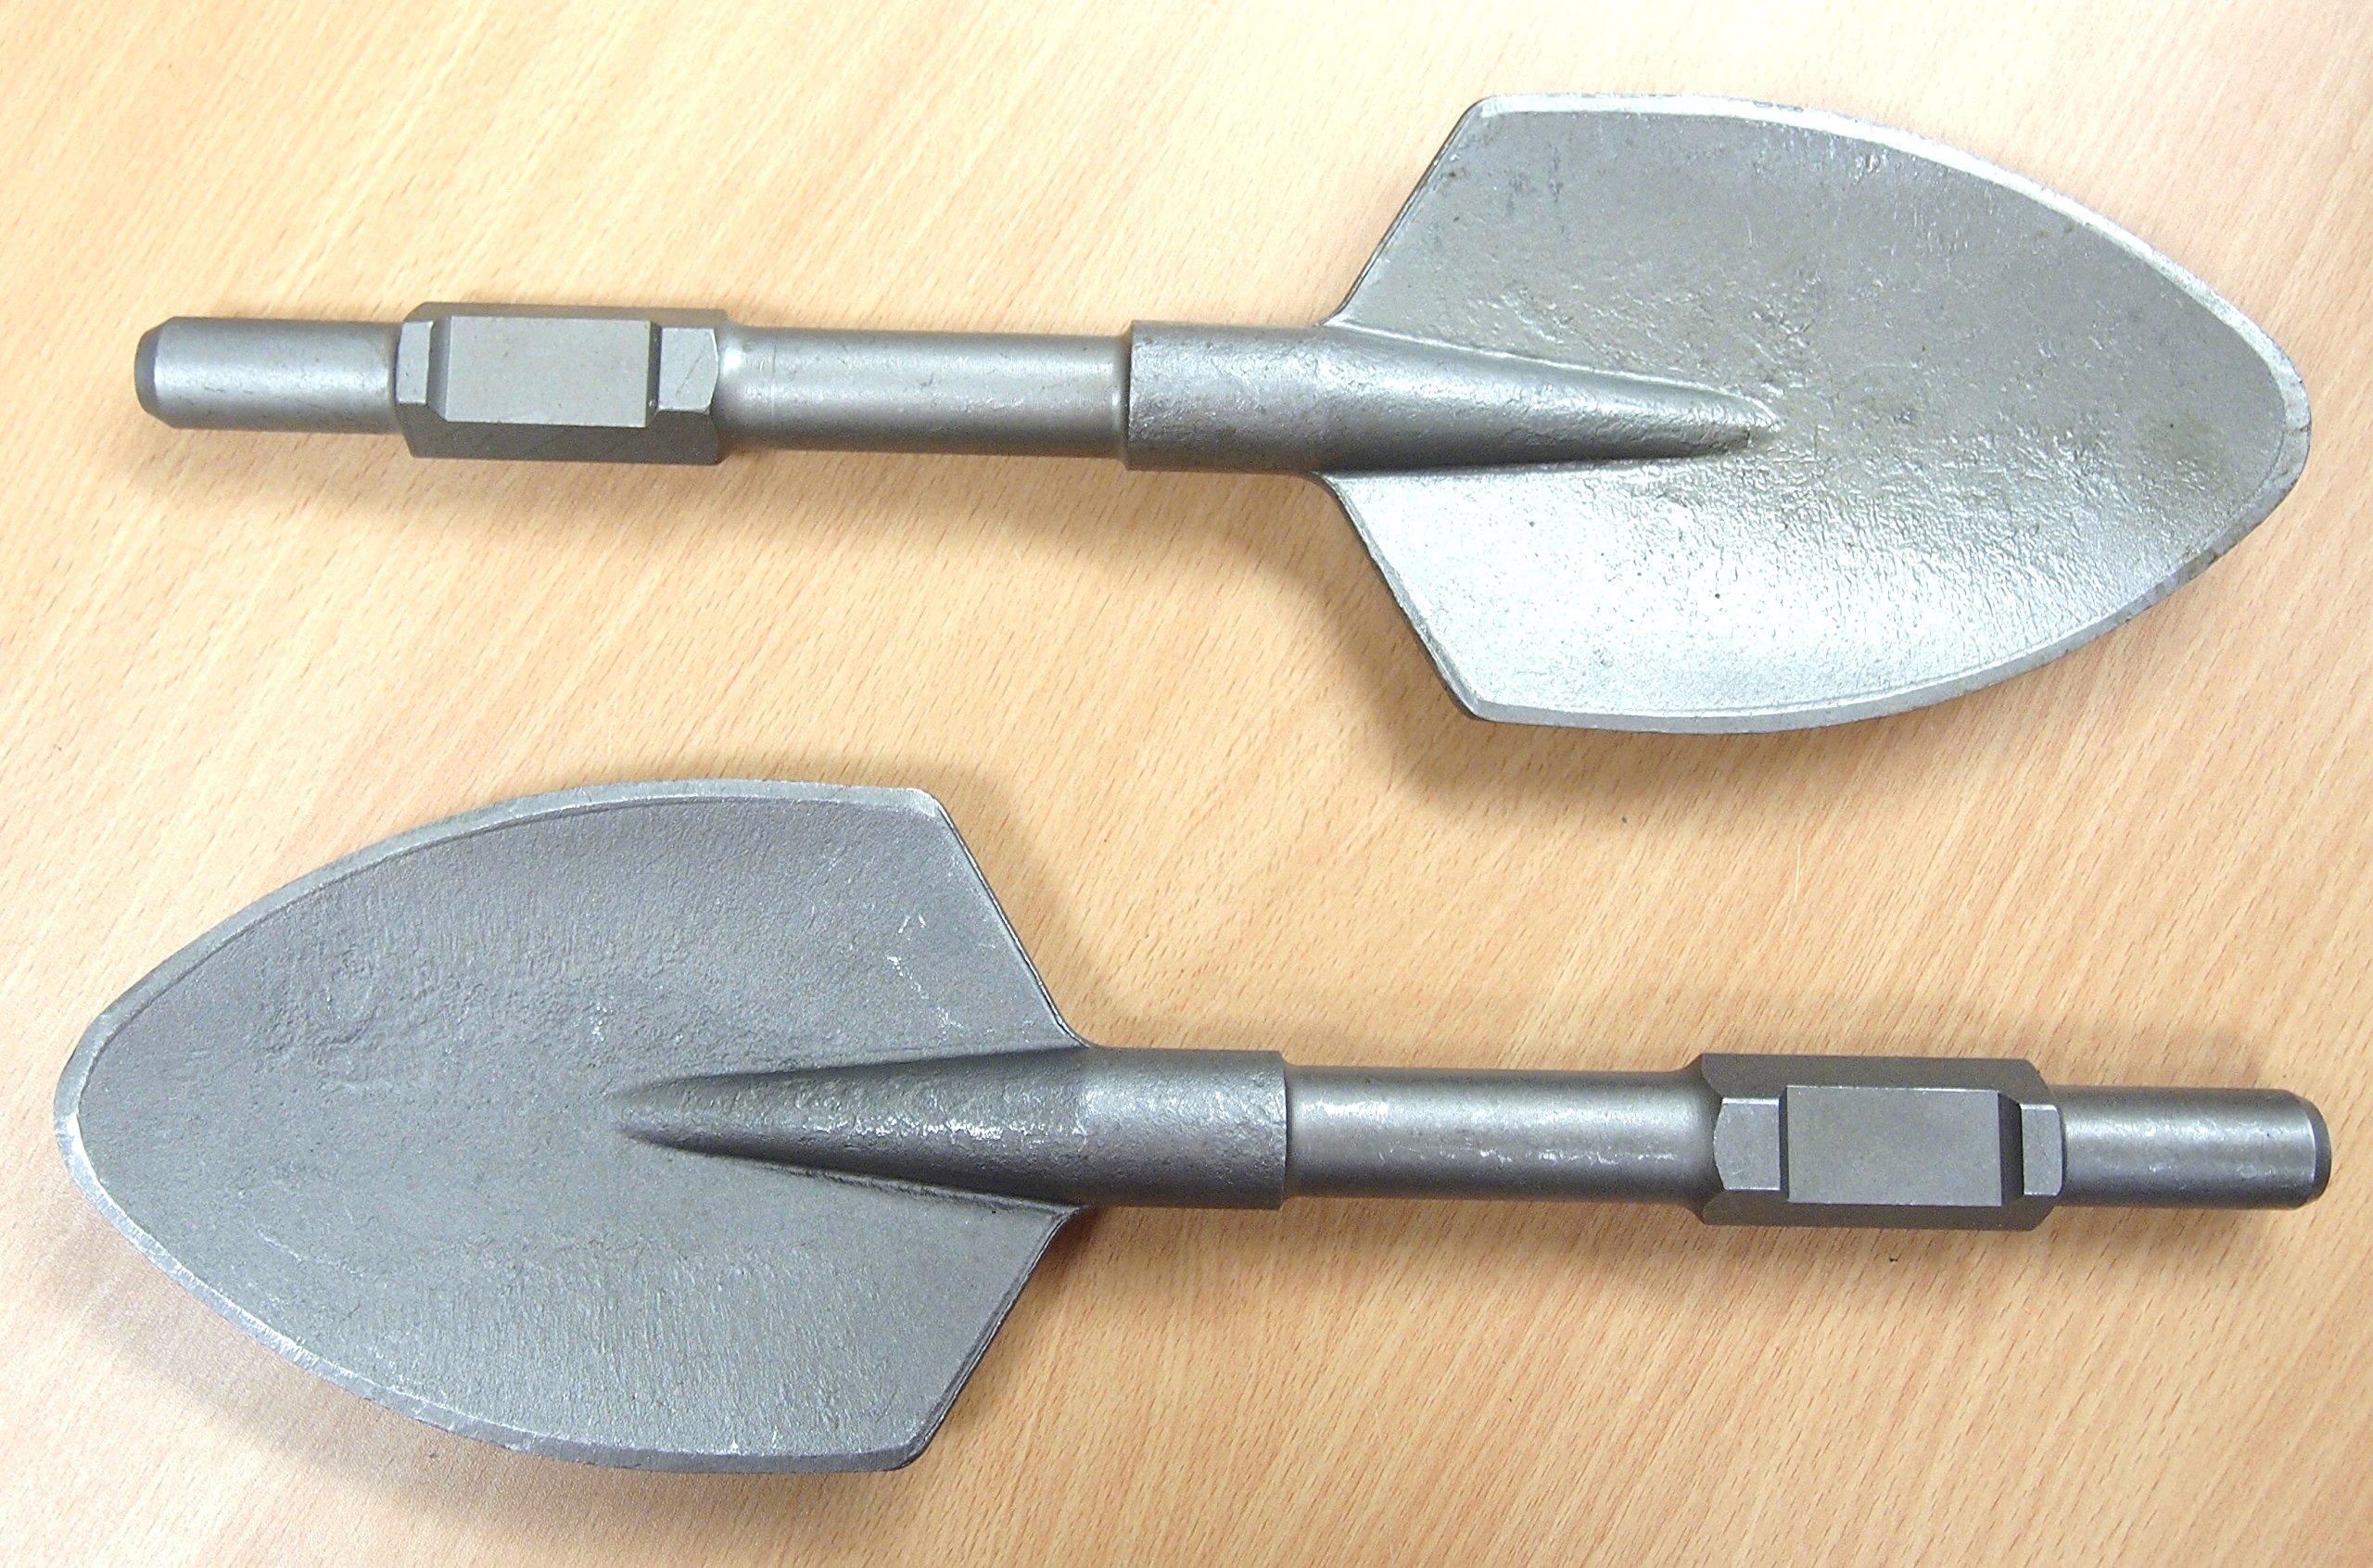 Lot of (2) Spade Shovel Head Bit Demolition Jack Hammer attachment 1-1/8'' Hex Shank by e7tools